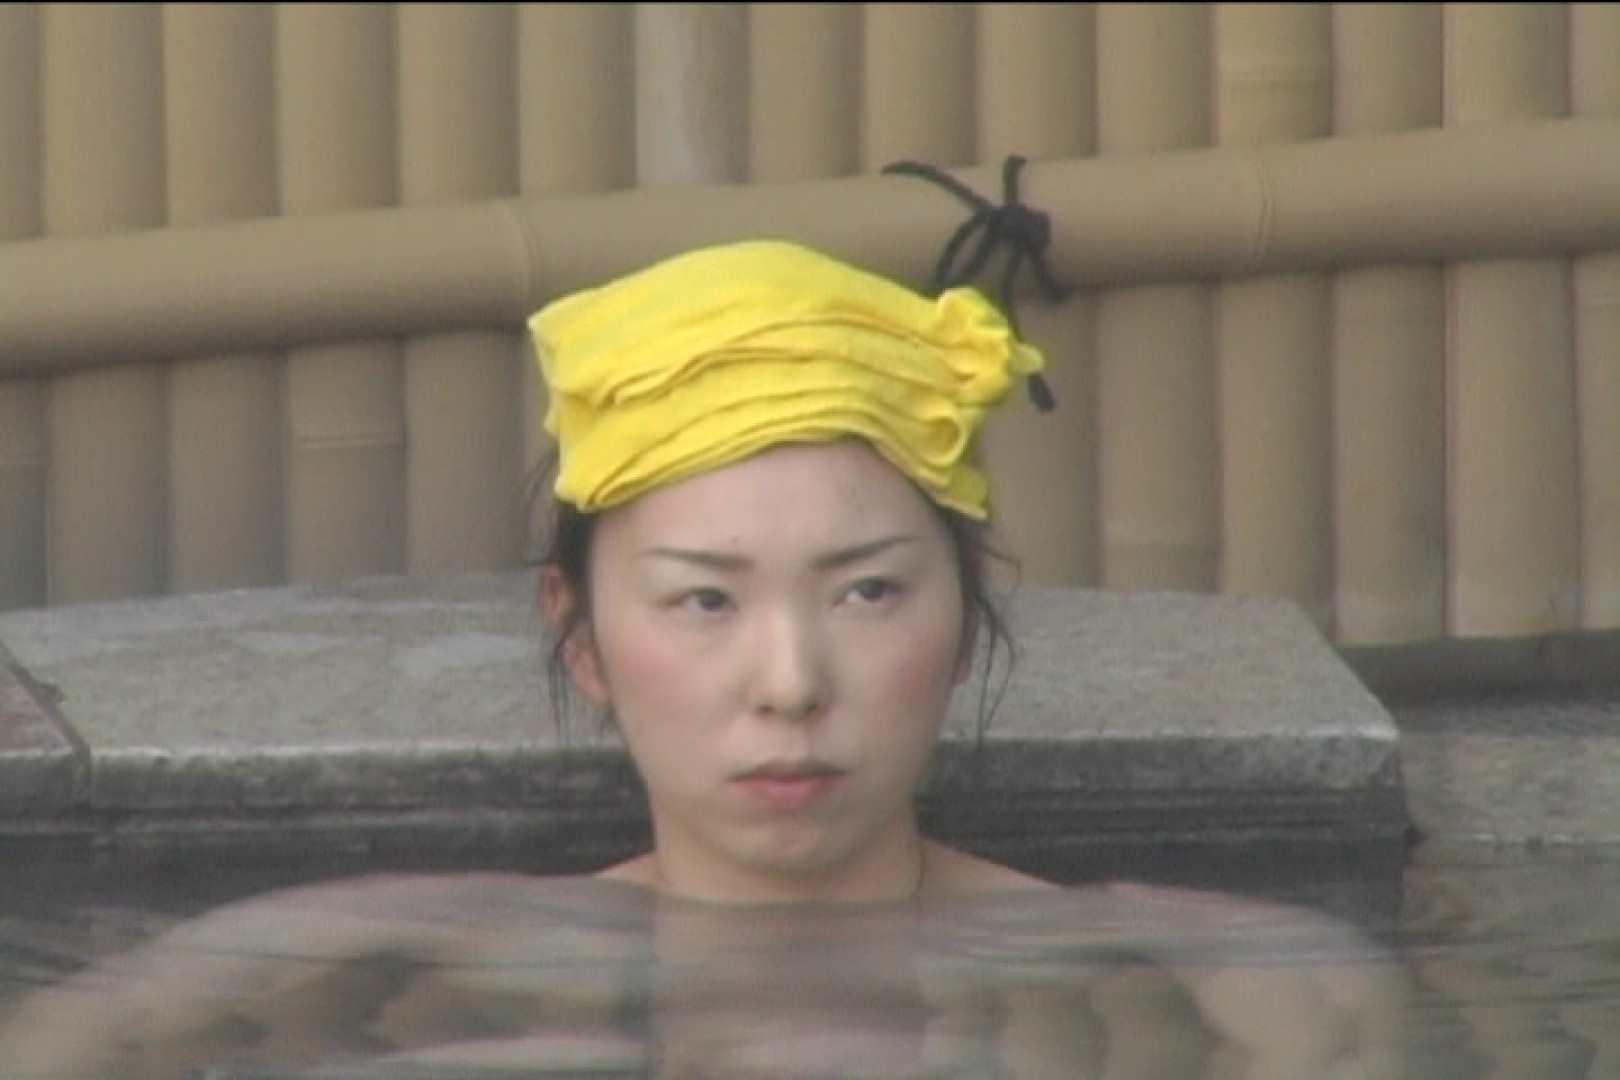 Aquaな露天風呂Vol.529 盗撮シリーズ | 露天風呂編  106PIX 61